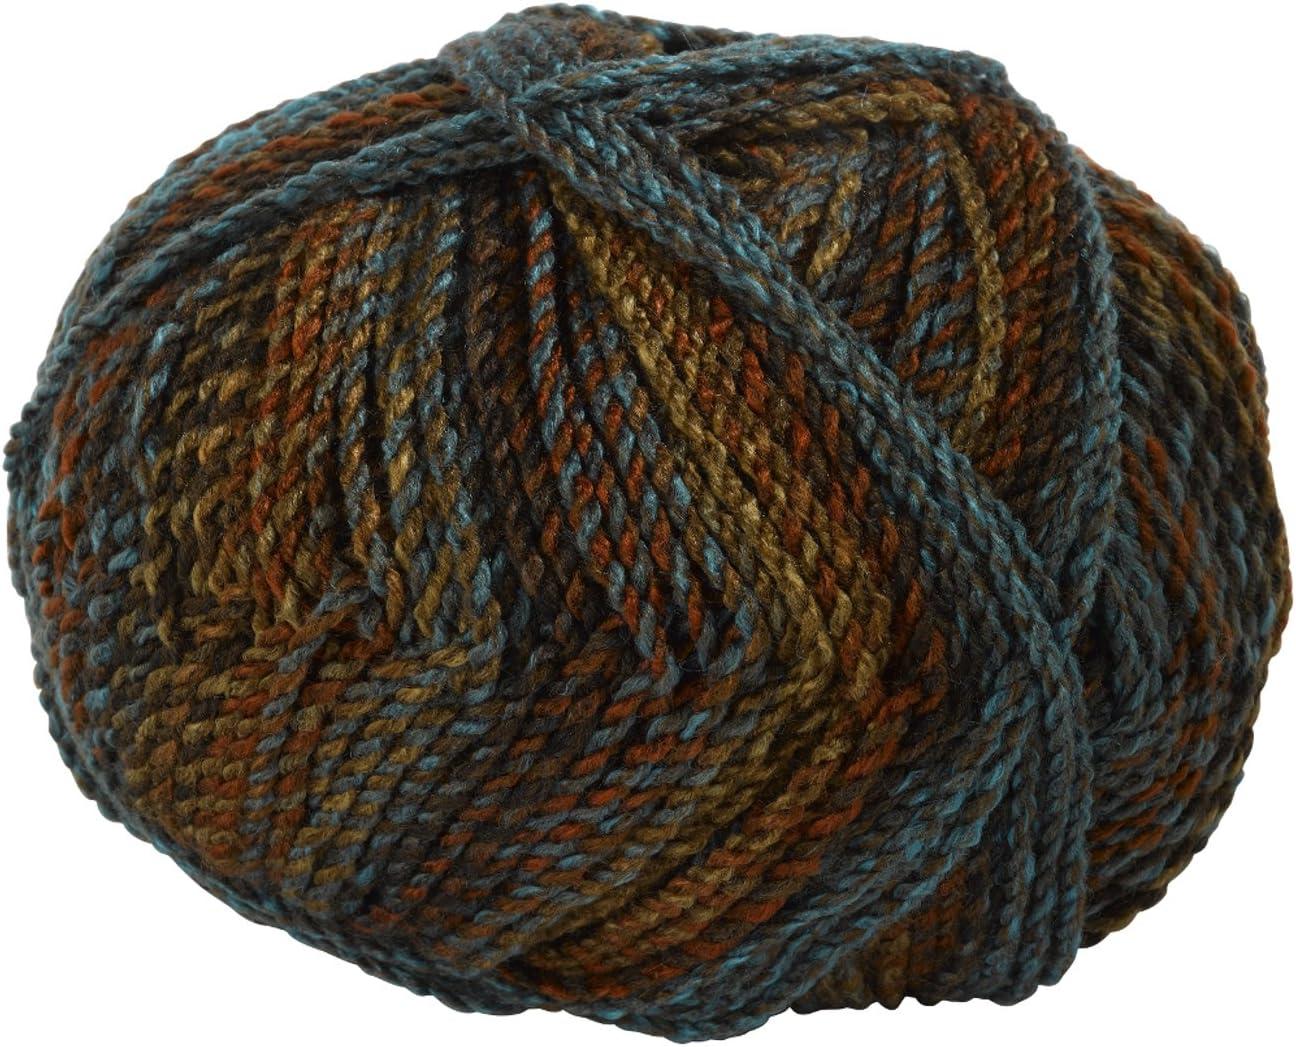 Brown /& Blue Mix MC6 James Brett Marble Chunky Knitting Yarn 100/% Soft Acrylic Wool 200g Ball